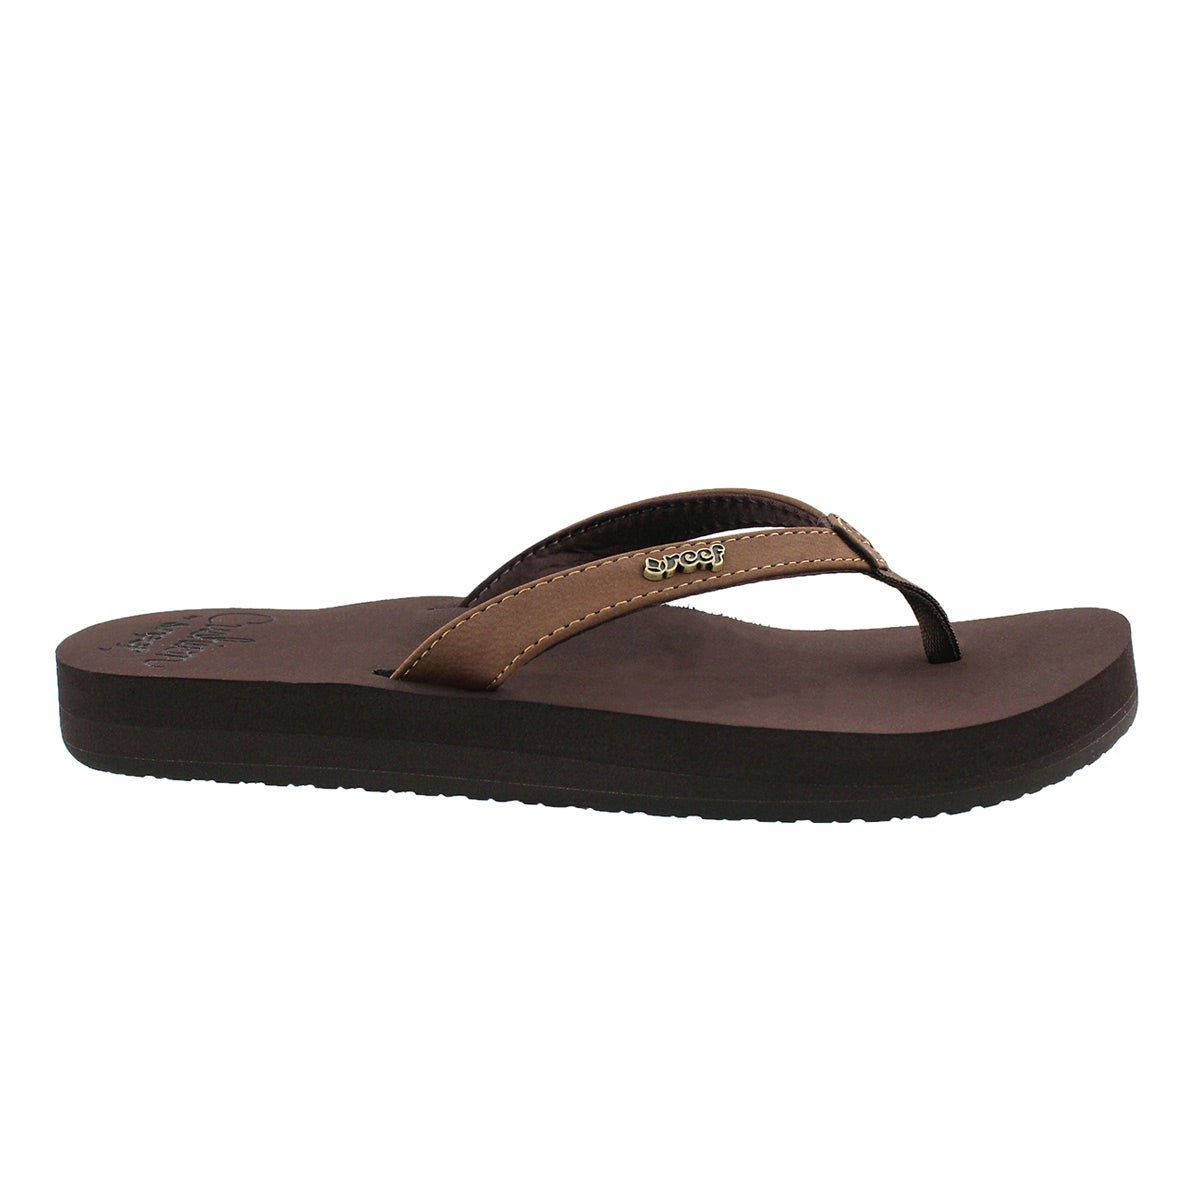 Lds Cushion Luna brown flip flop